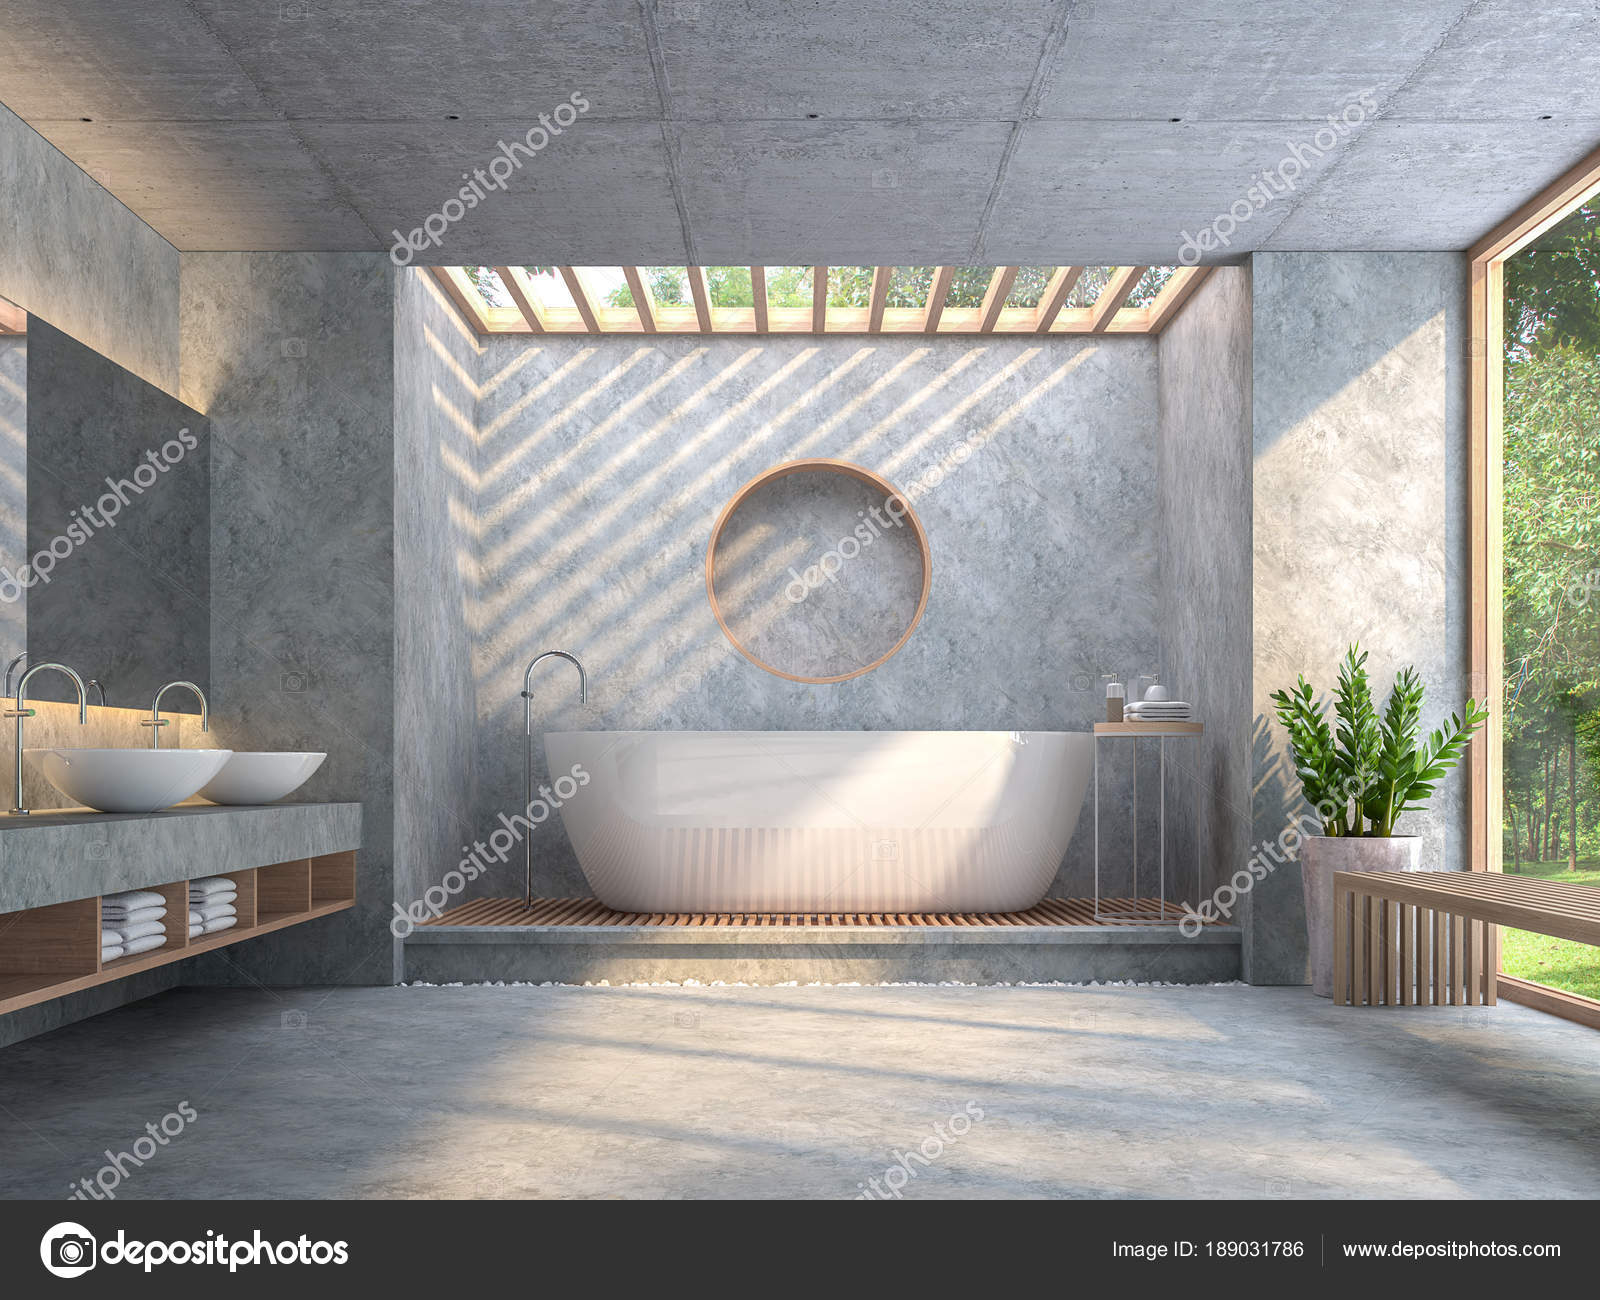 Simpel Pure Badkamer : Moderne loft stijl badkamer met gepolijste beton render ingericht